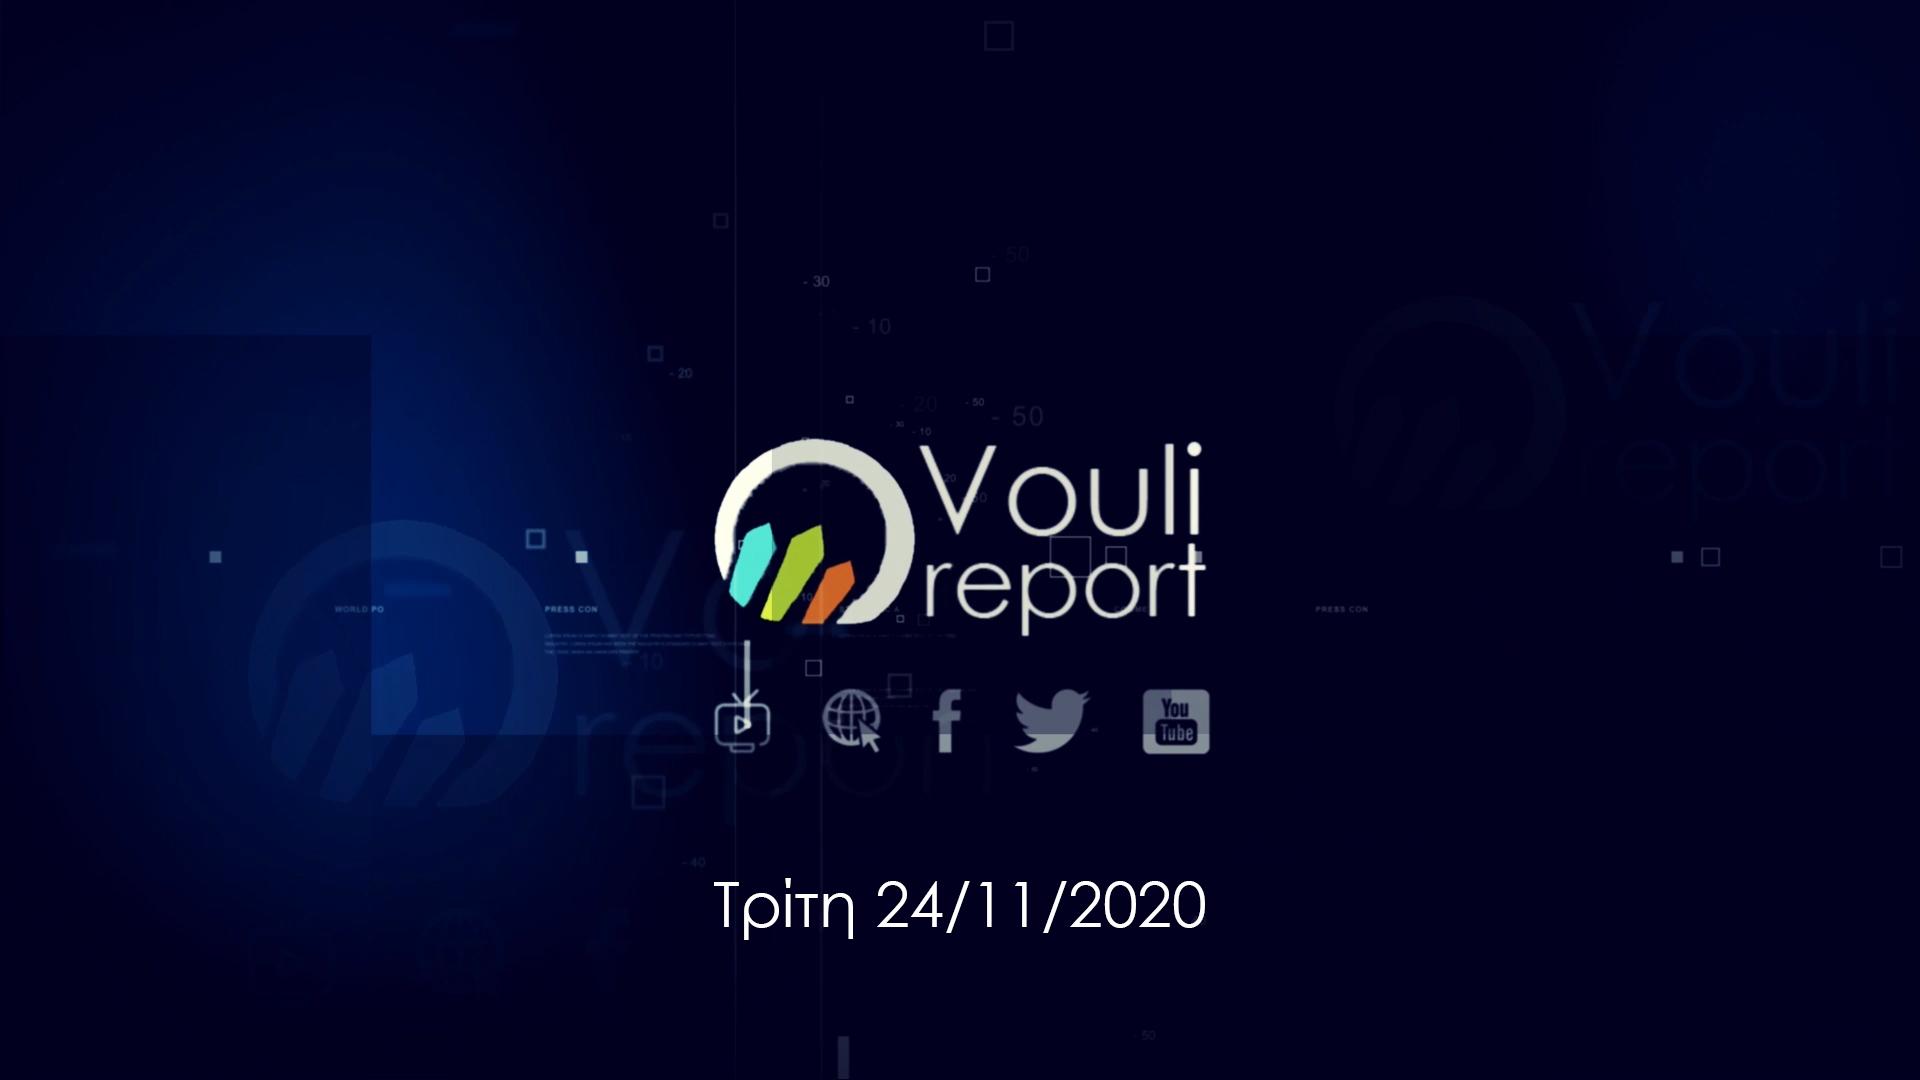 Vouli report | 24/11/2020